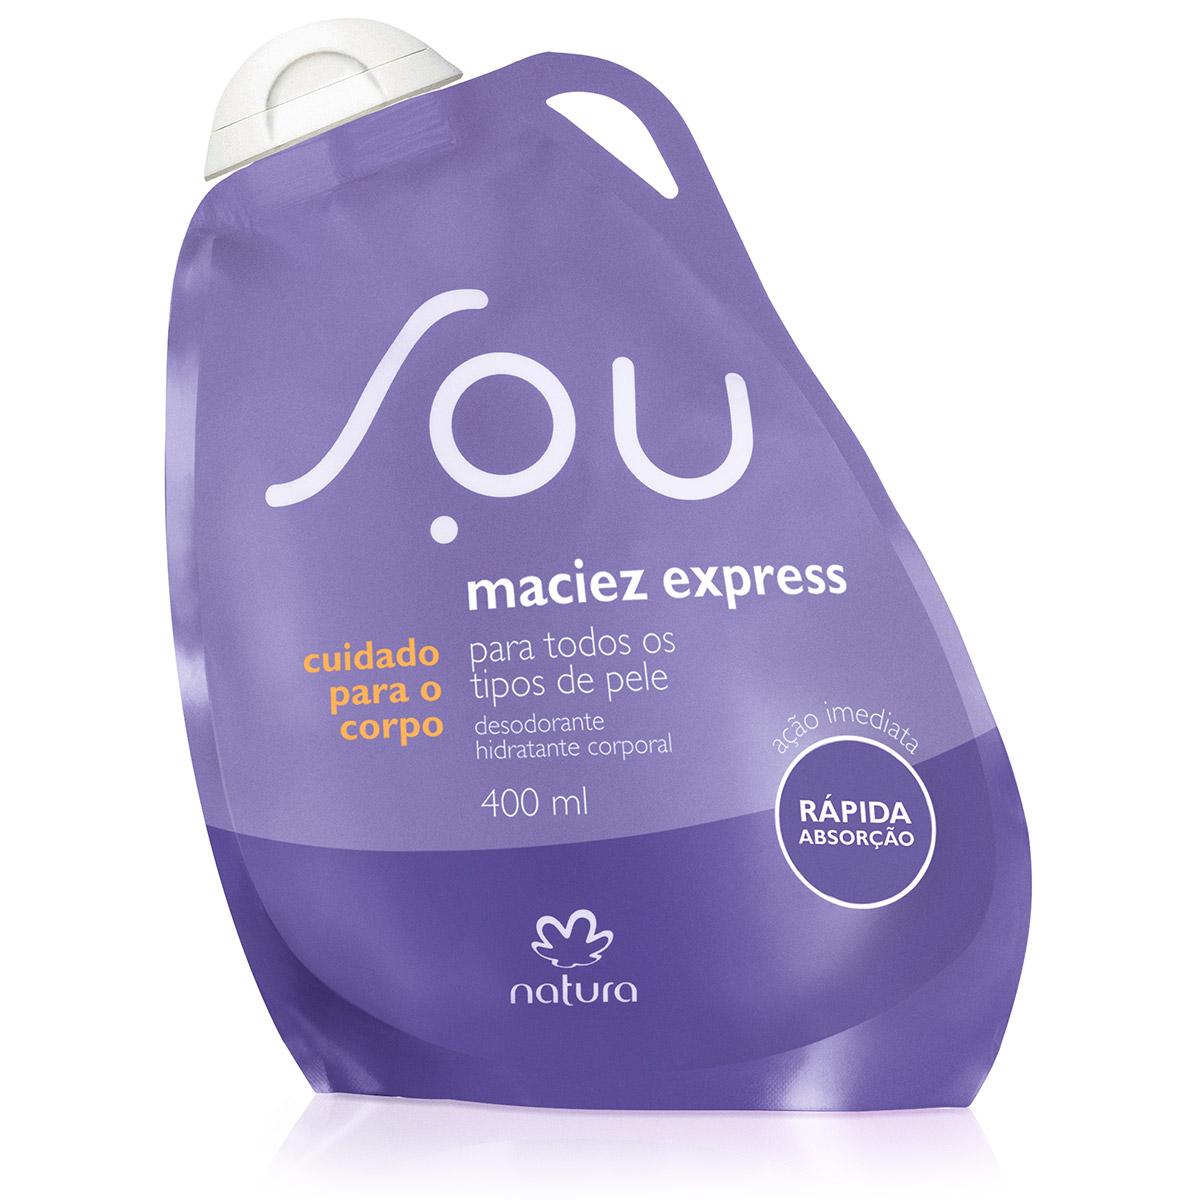 Desodorante Hidratante Corporal Maciez Express SOU - 400ml - 78971